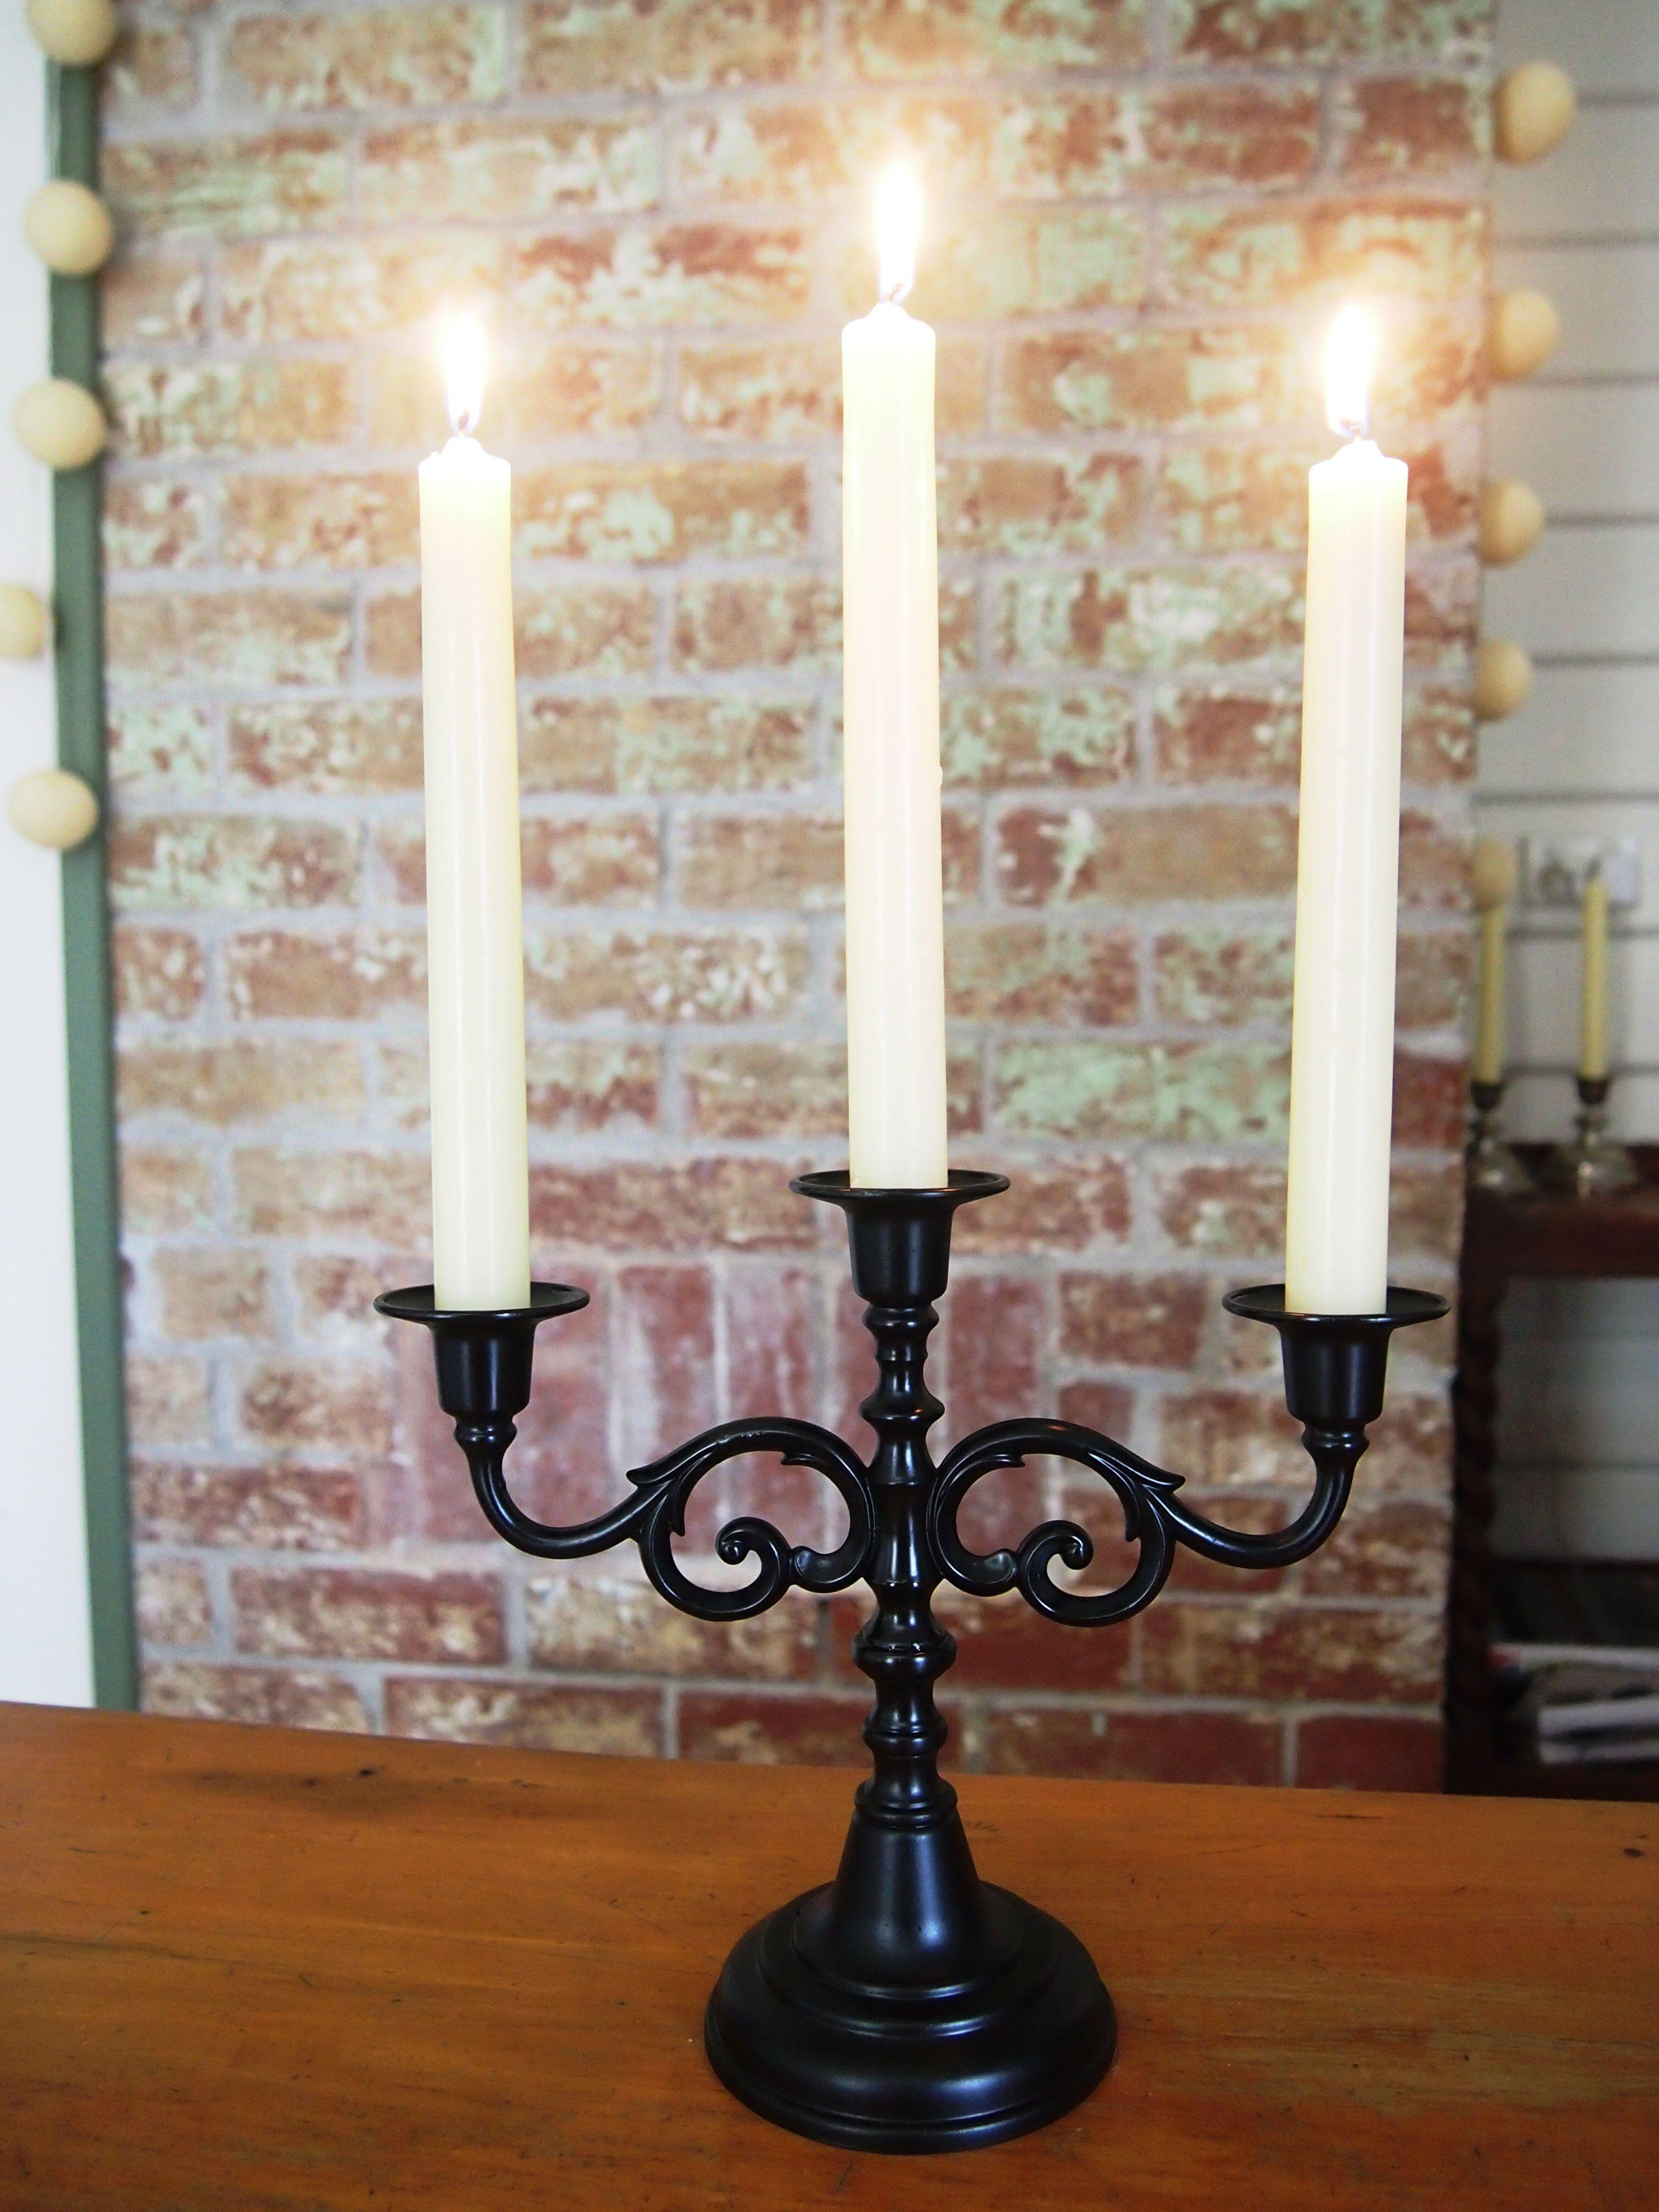 Spray paint candelabra casa decoraçãoideias pinterest